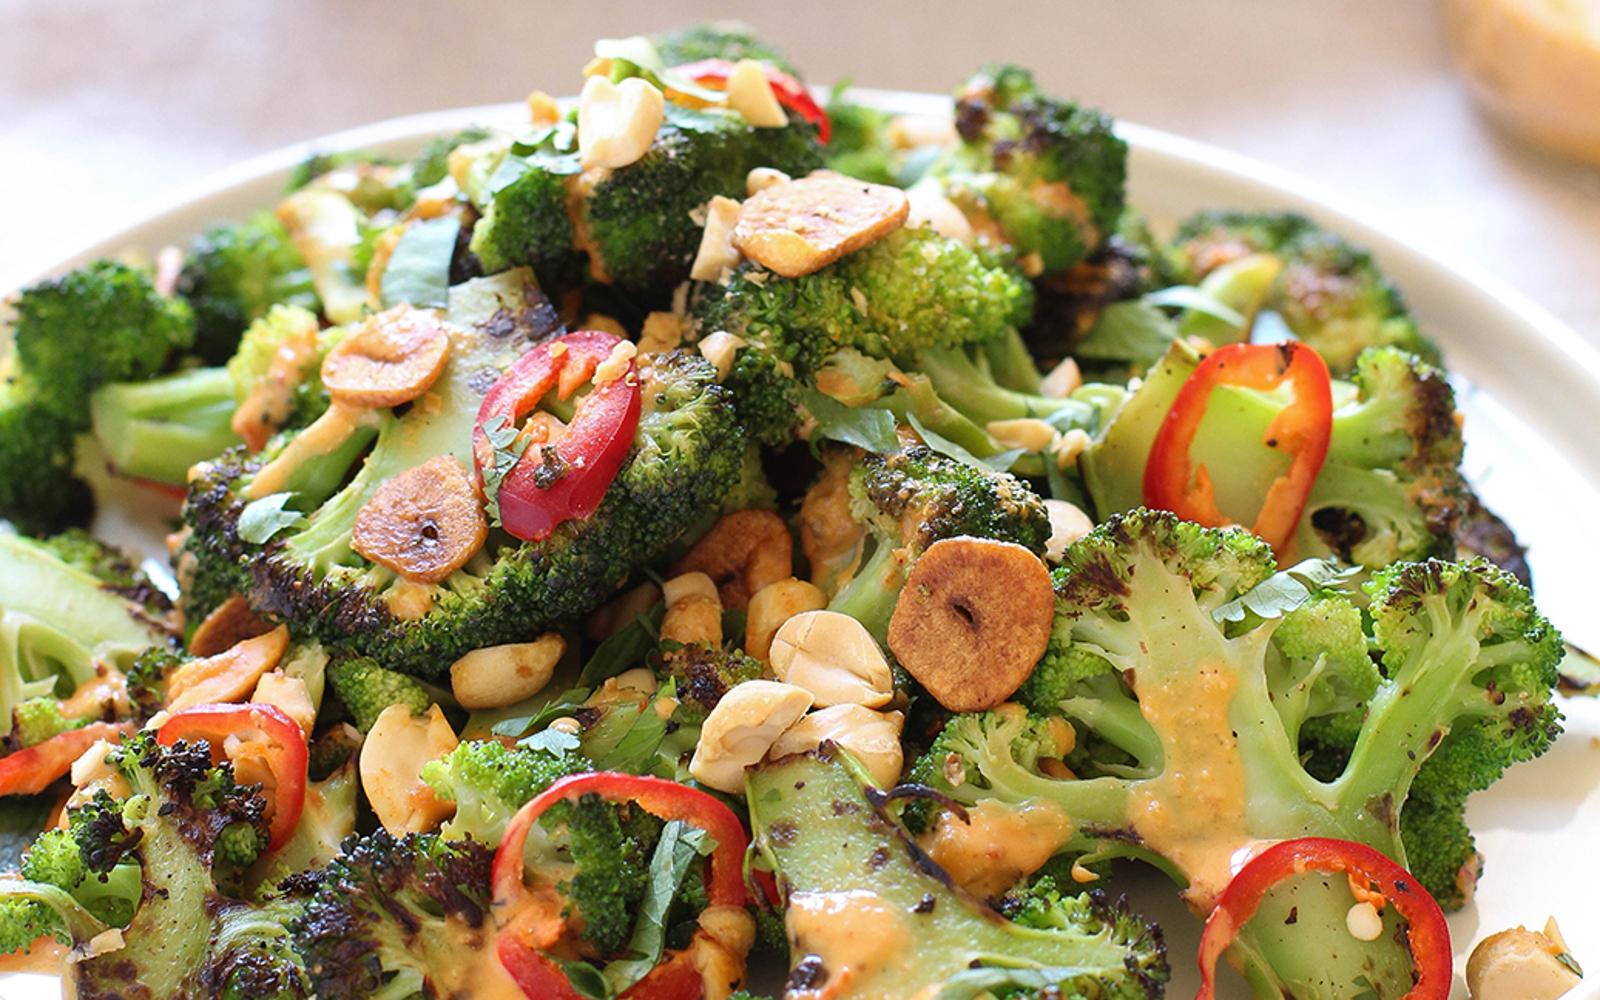 Spicy Broccoli Salad With Peanut Dressing 3